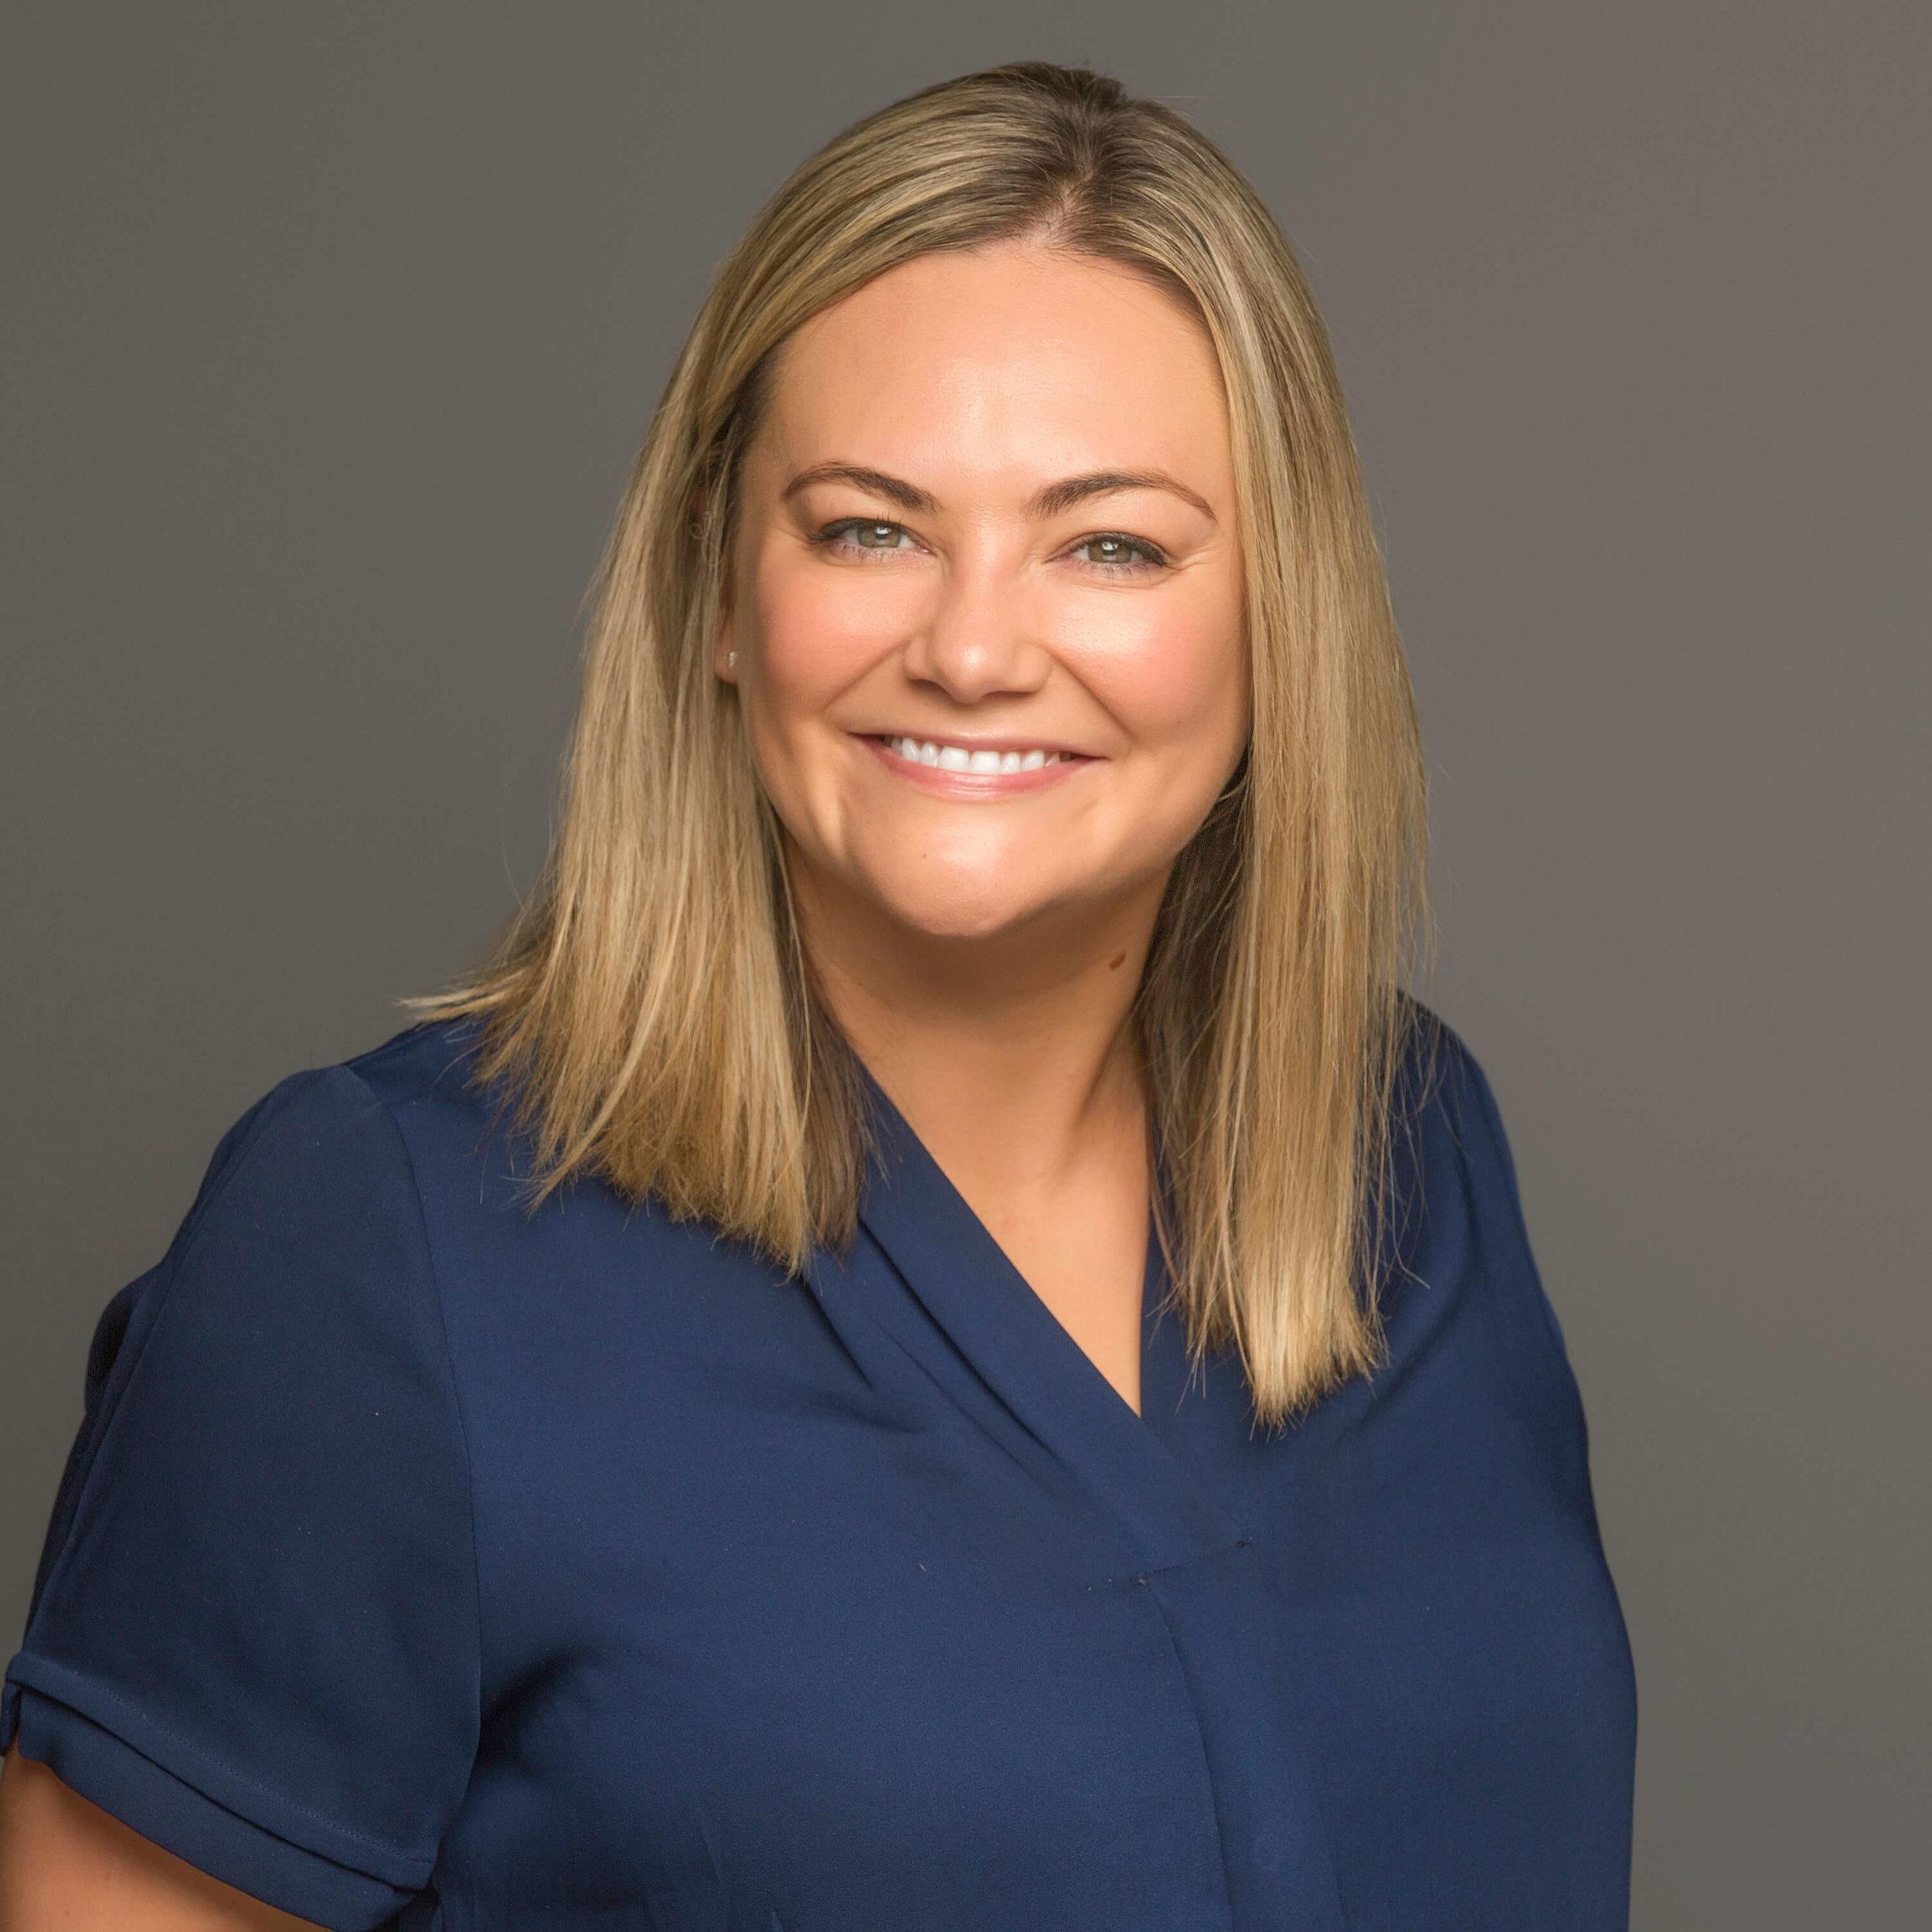 Kingston Beach Dental - pain free dentist in Hobart